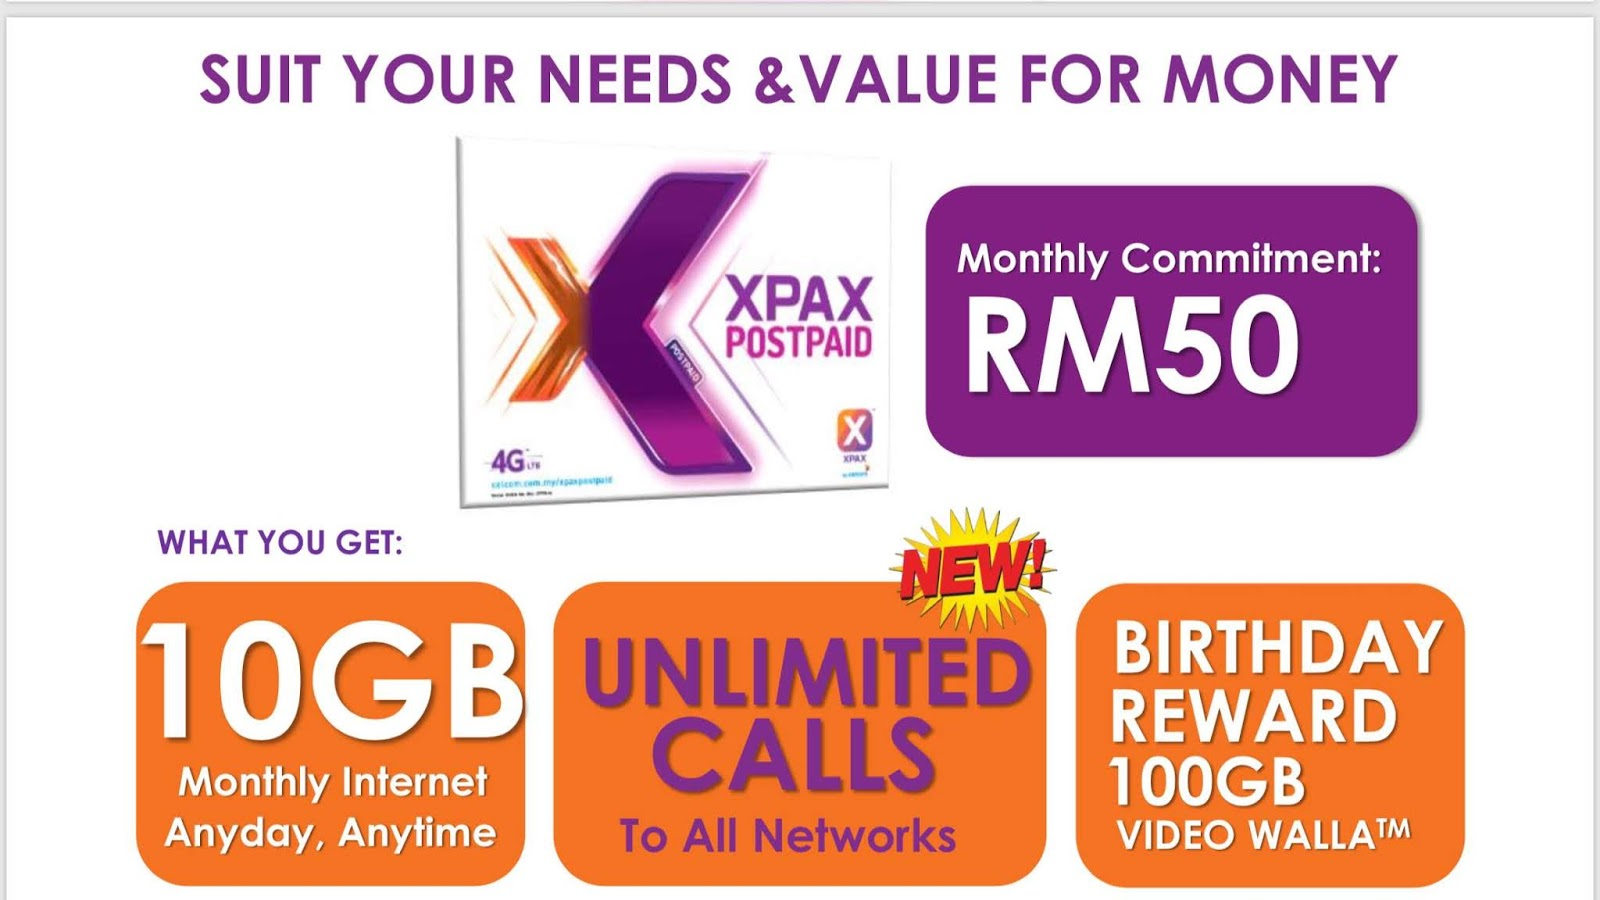 Celcom Xpax Postpaid 50 2 0 Unlimited Call 10gb Data Cerita Budak Sepet